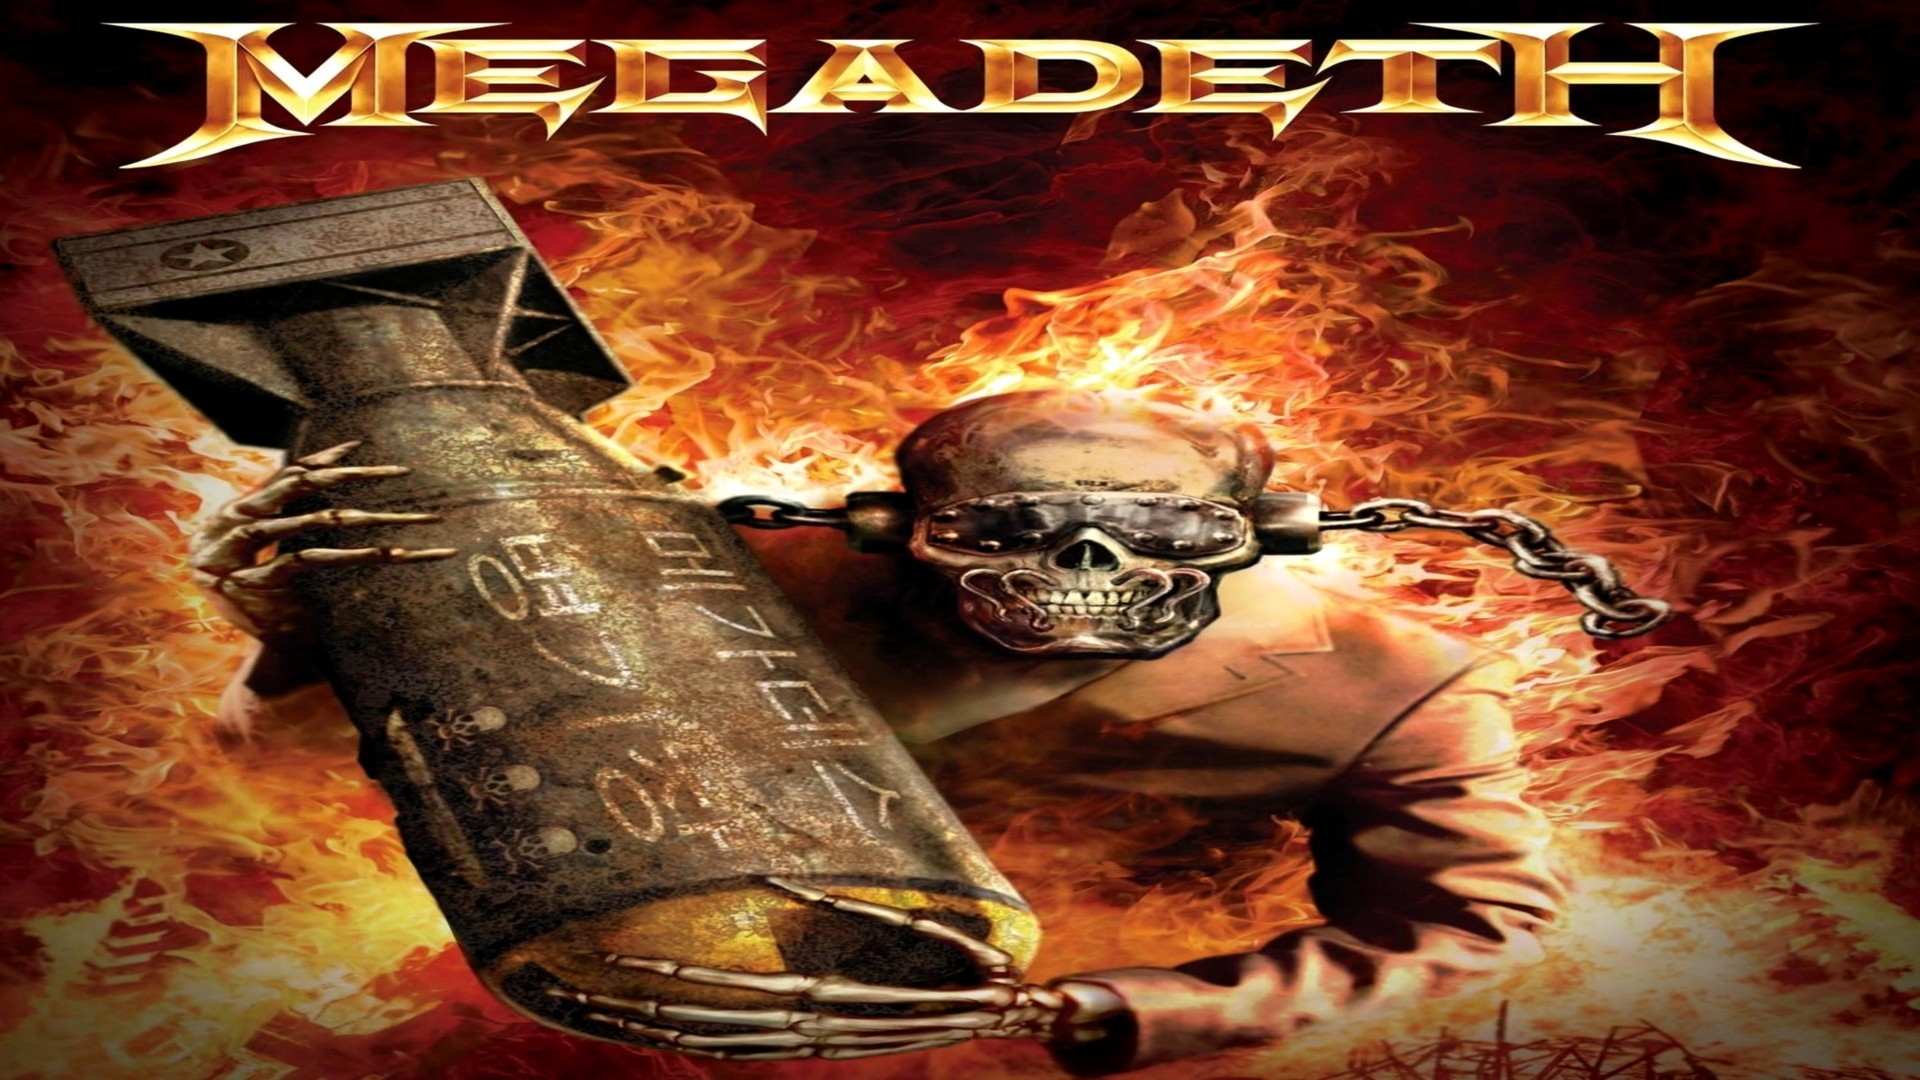 Megadeth Wallpaper   HD Desktop Wallpapers